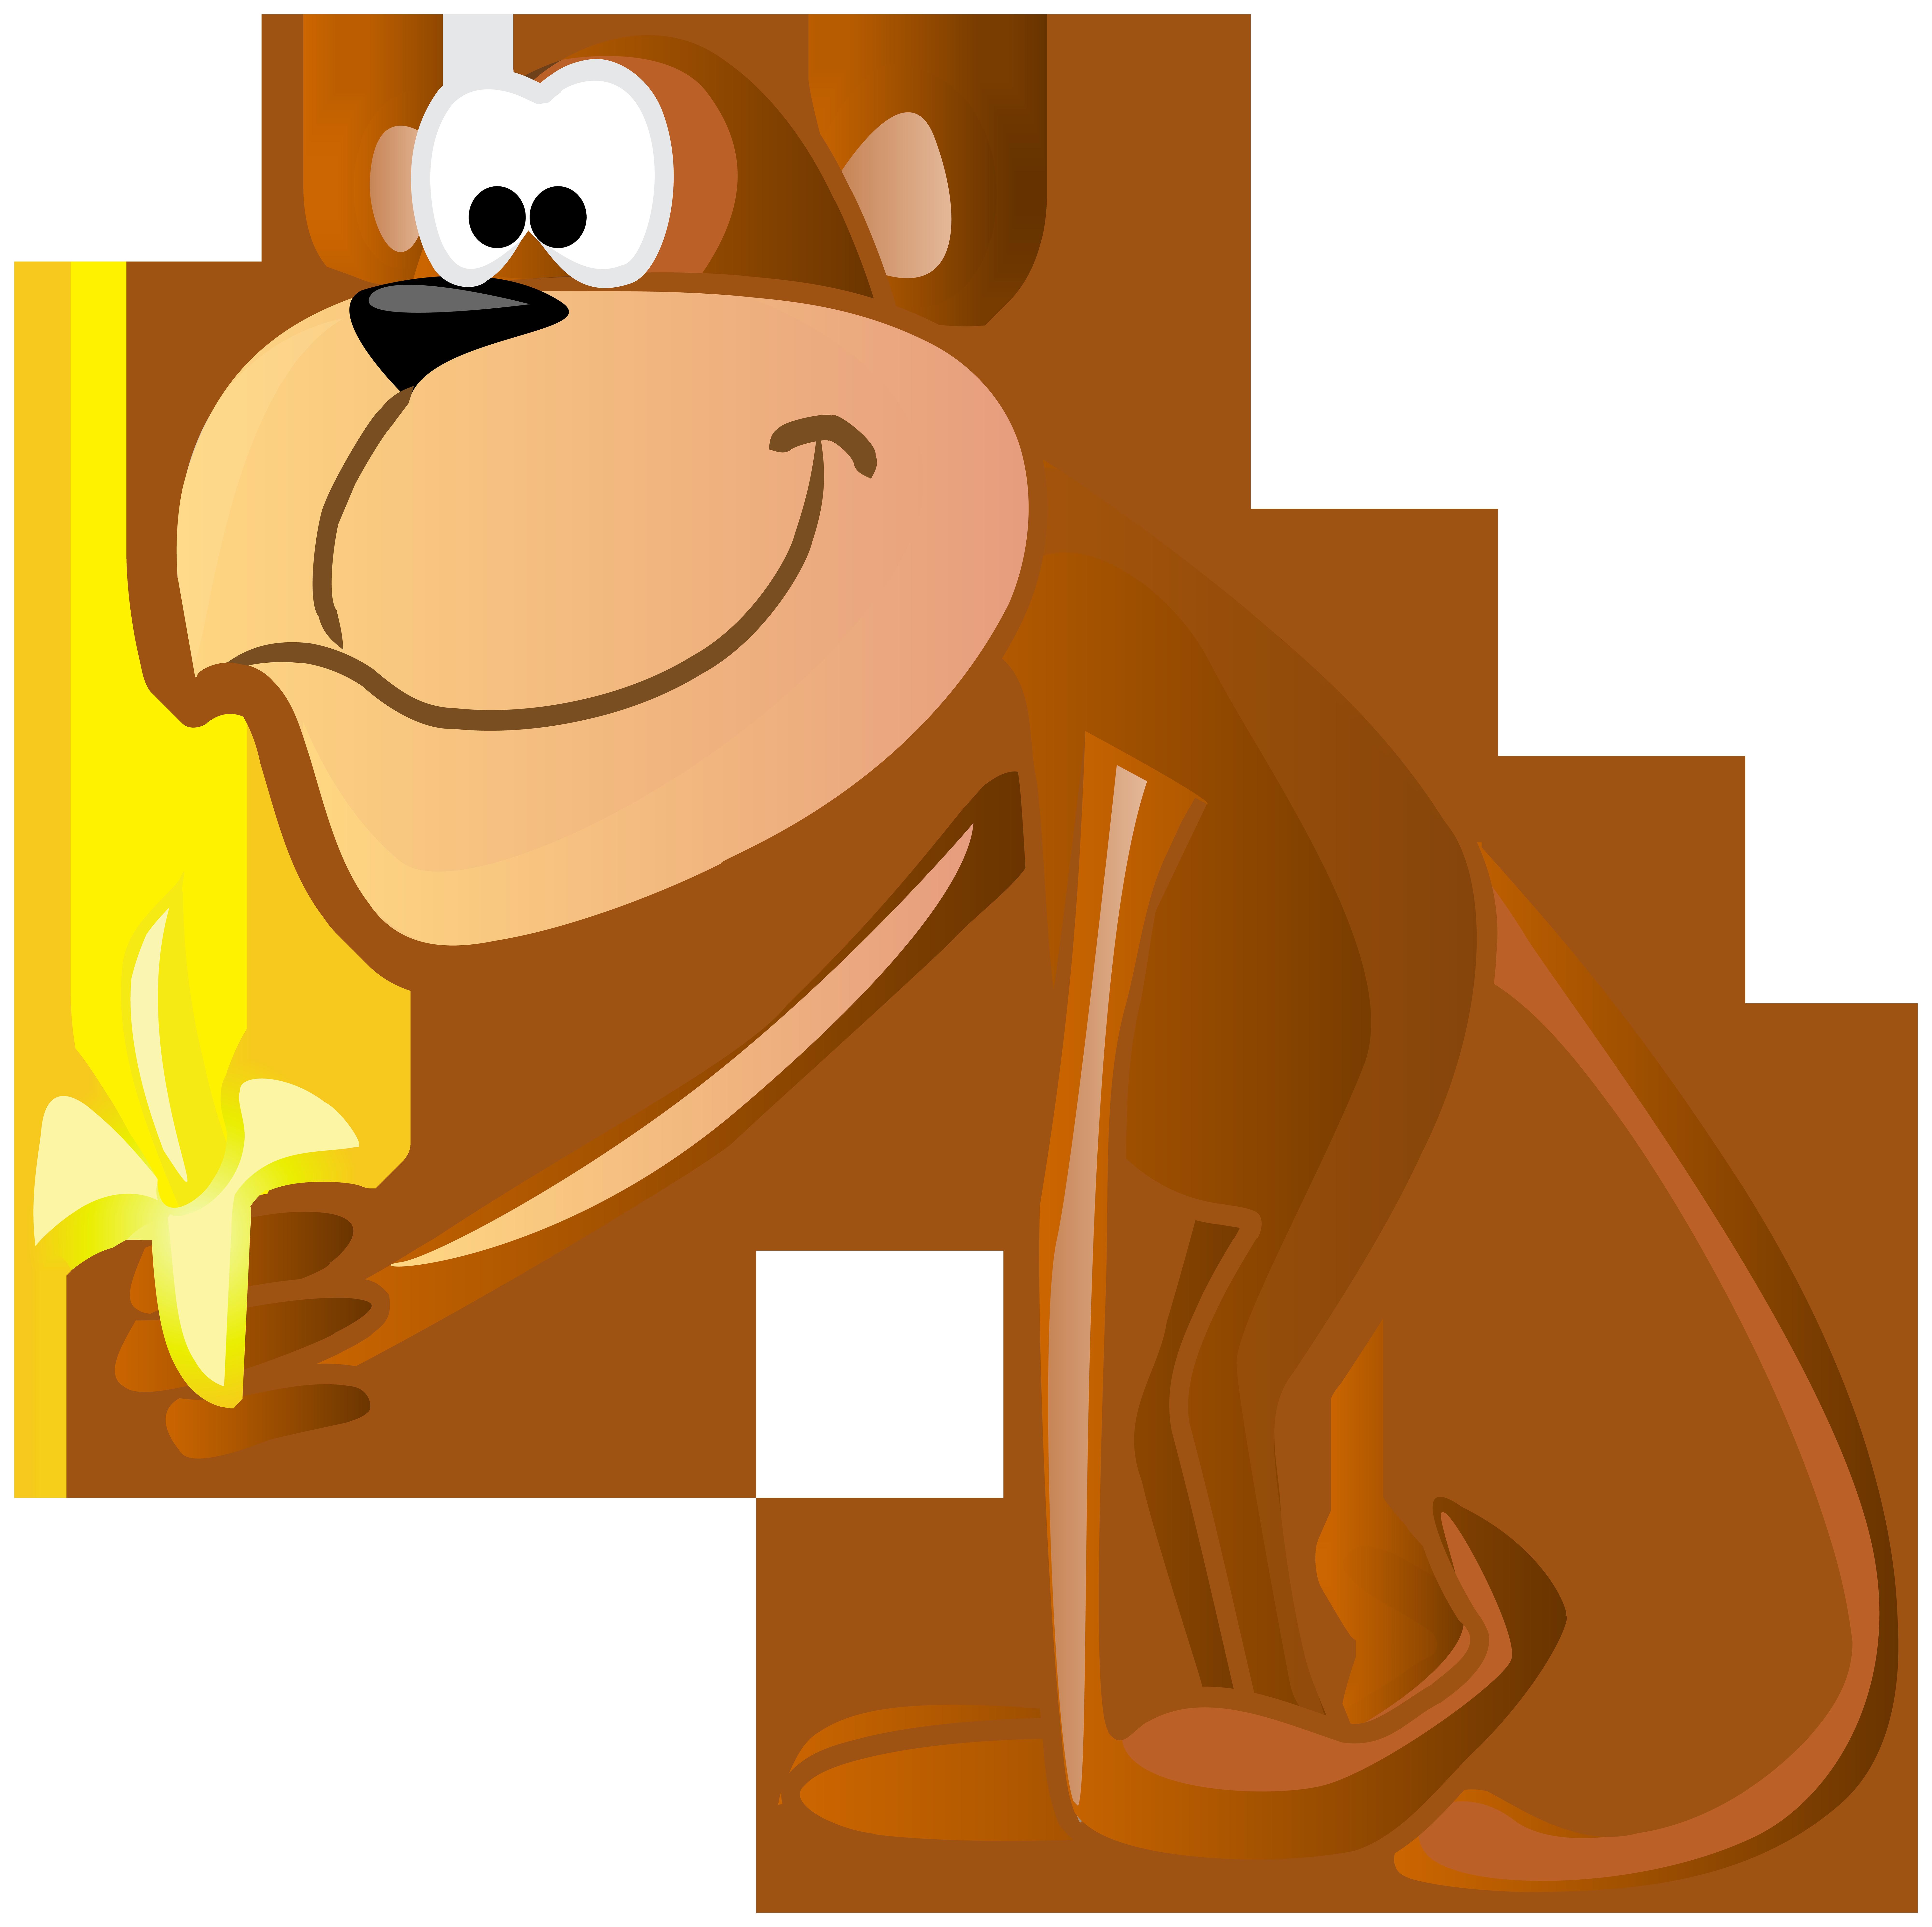 Cartoon clip art image. Valentine clipart monkey